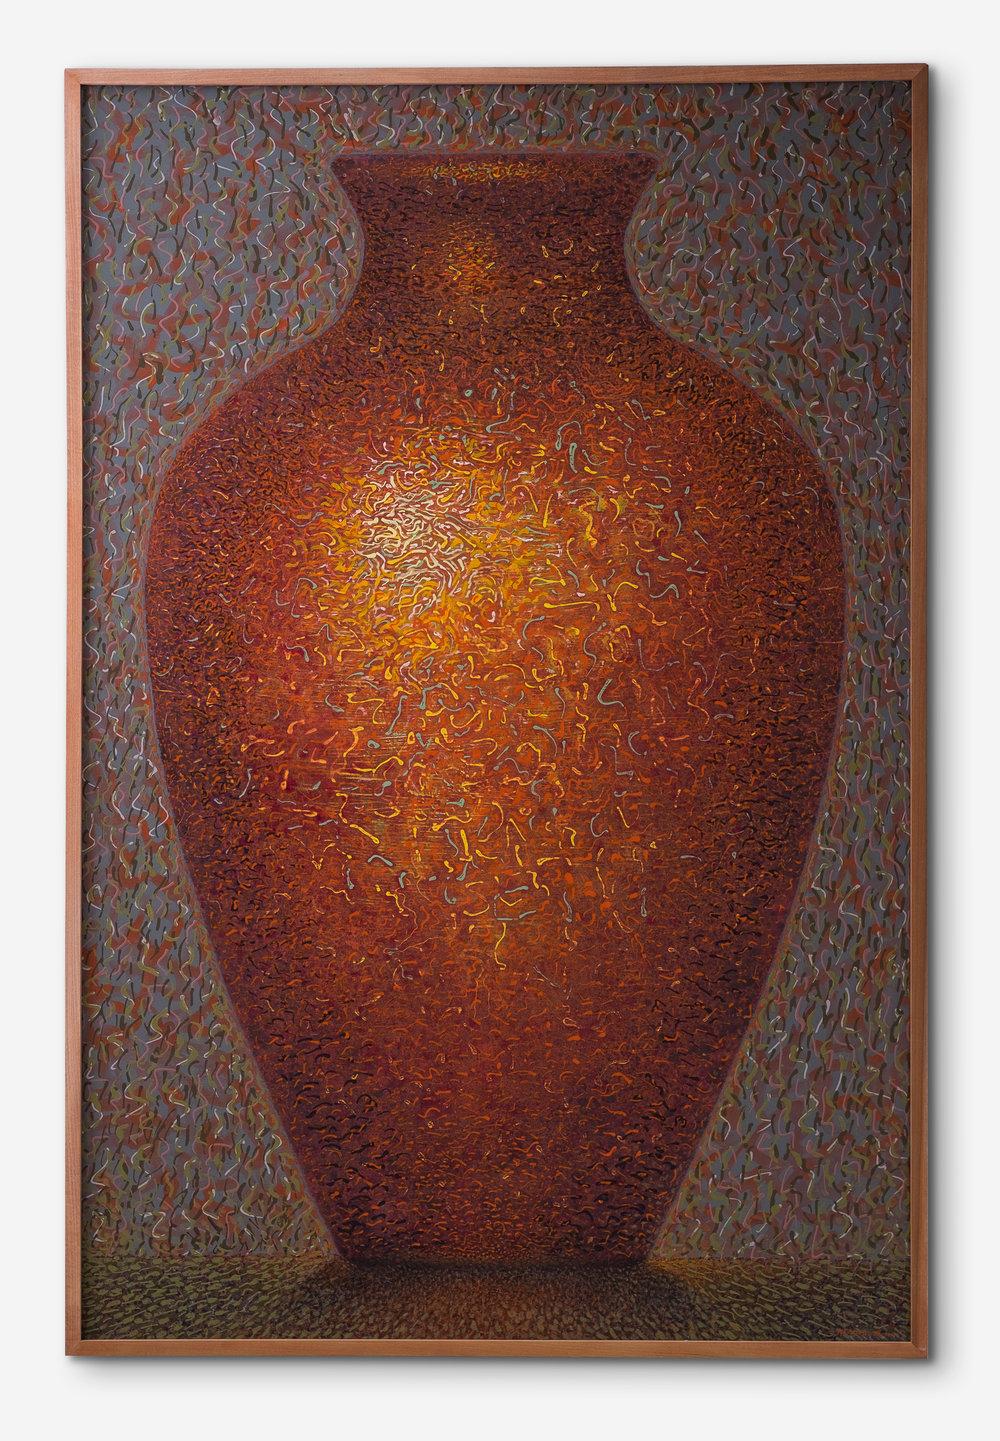 Earth Vase #20